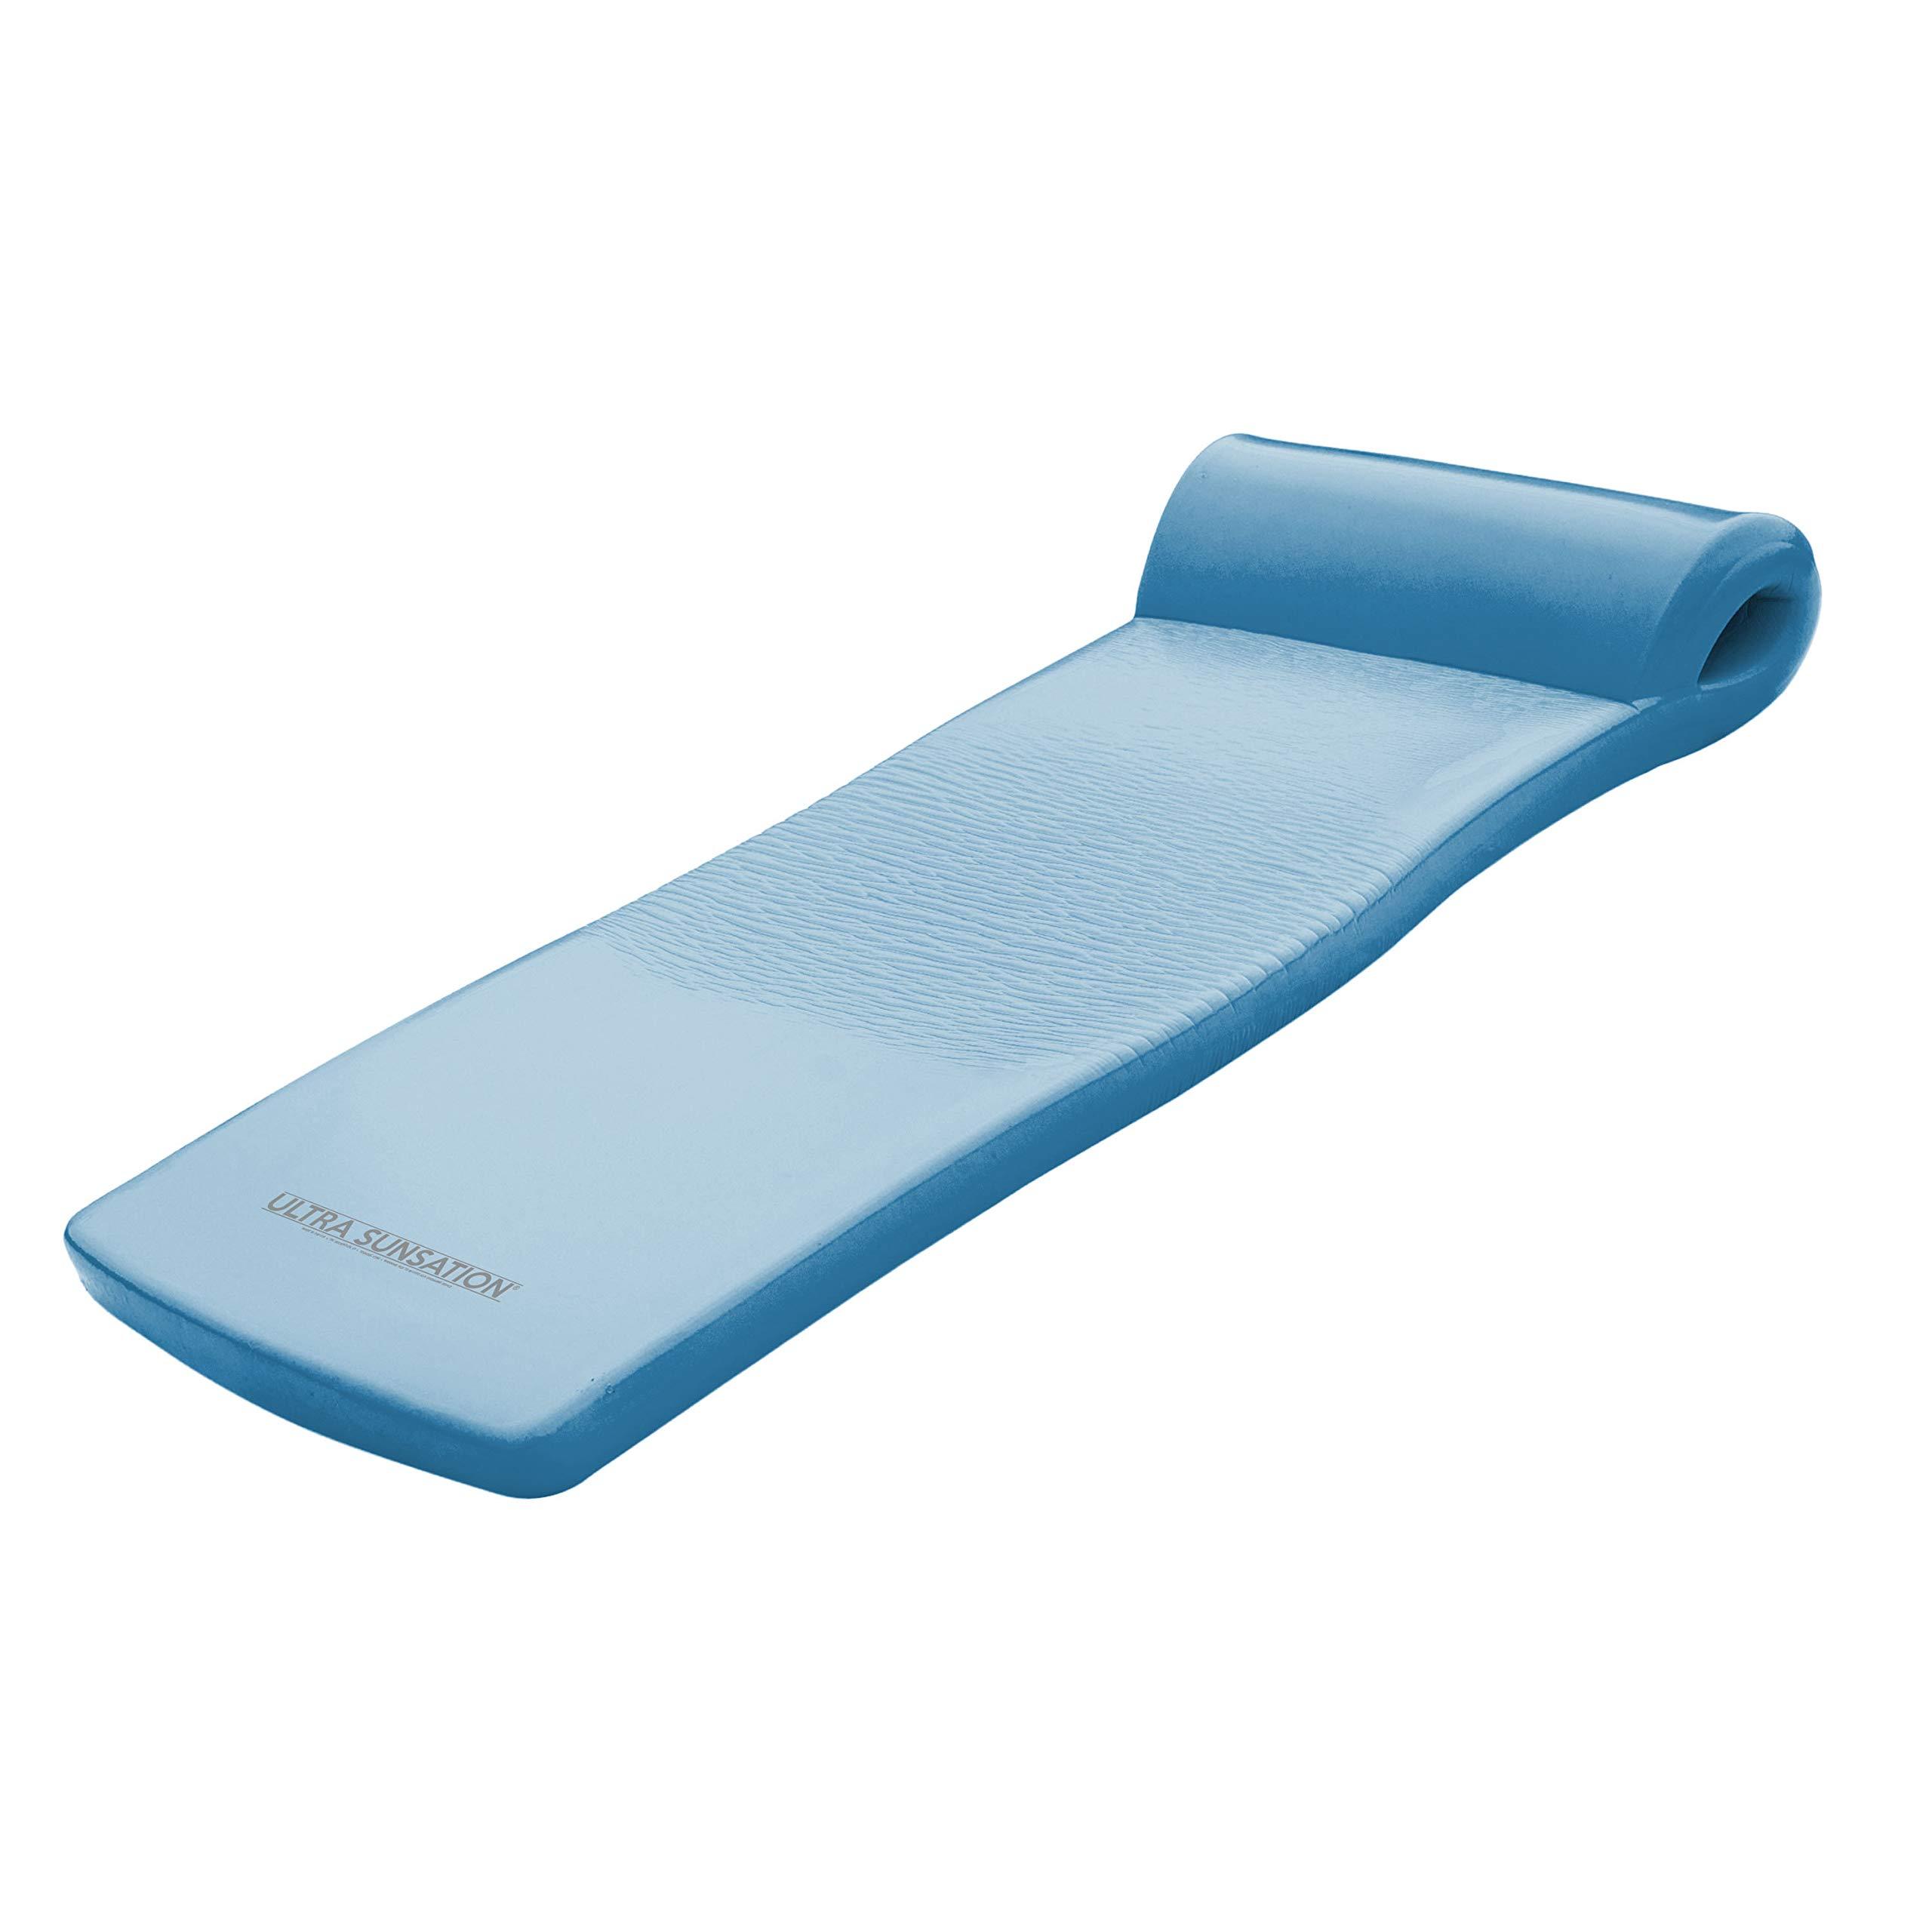 TRC Recreation Ultra Sunsation Pool Float, Metallic Blue